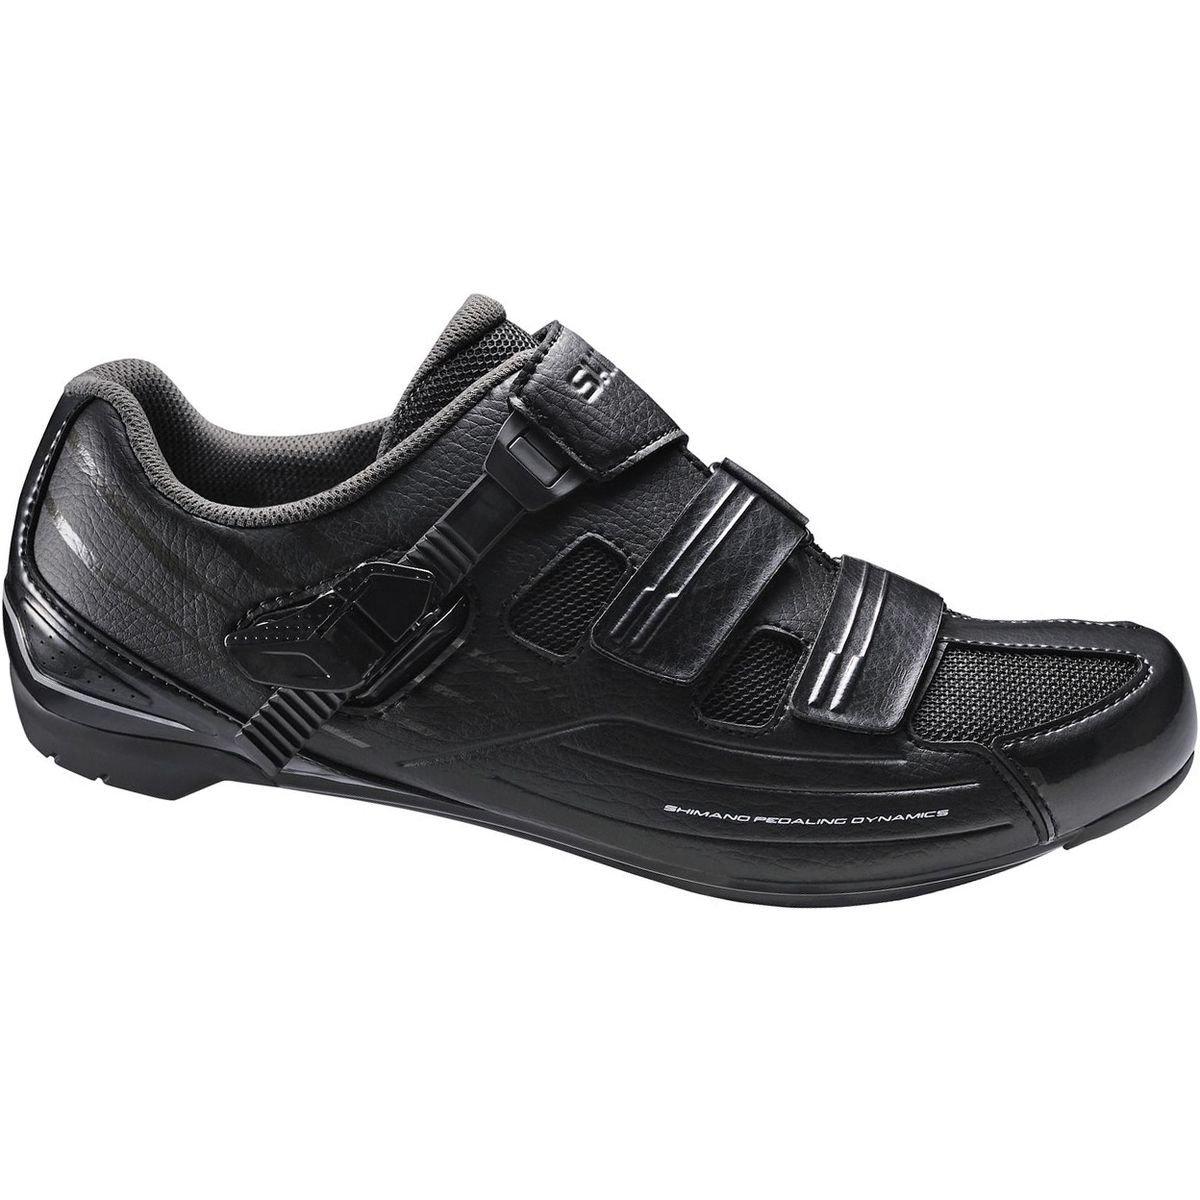 Shimano Men's RP3 Black Road Cycling Shoes - 40